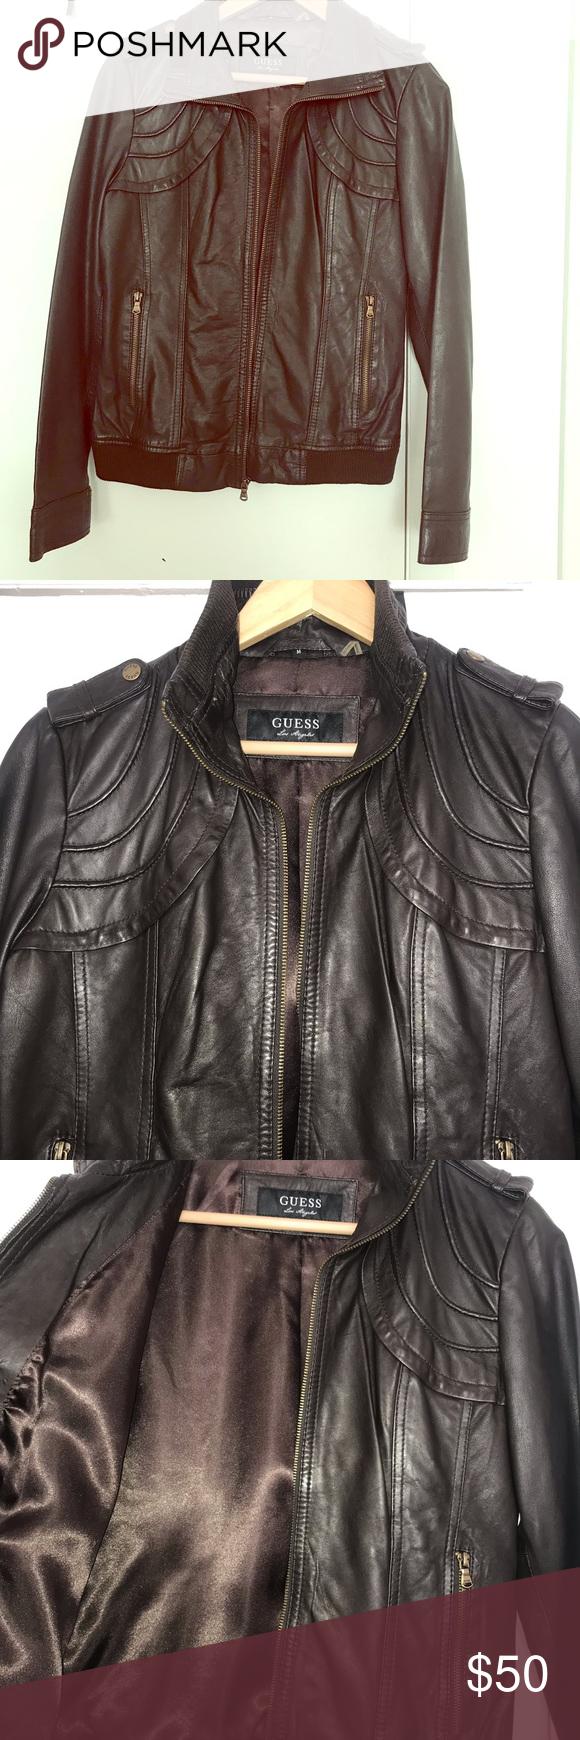 Guess Women S Dark Brown Vegan Leather Jacket M Brown Vegan Leather Jacket Vegan Leather Jacket Brown Faux Leather Jacket [ 1740 x 580 Pixel ]